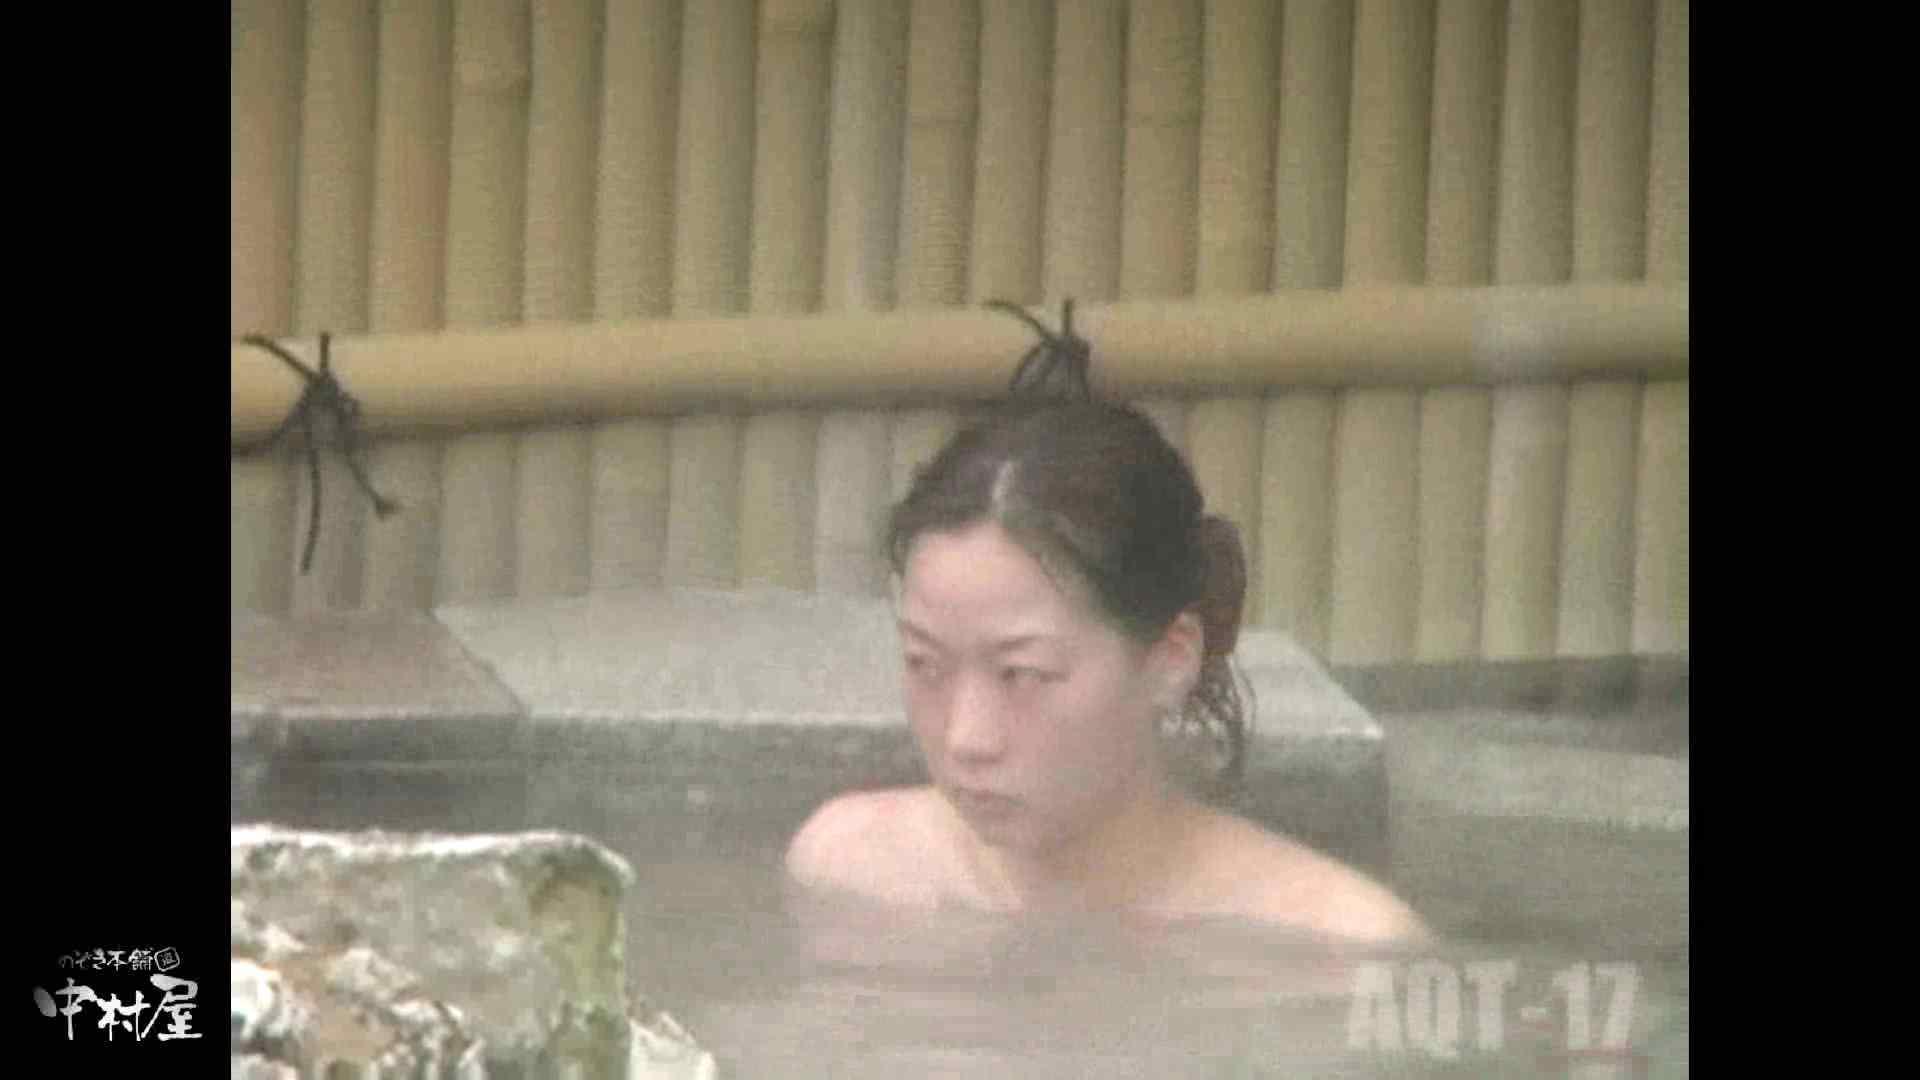 Aquaな露天風呂Vol.881潜入盗撮露天風呂十七判湯 其の一 OL  29連発 12